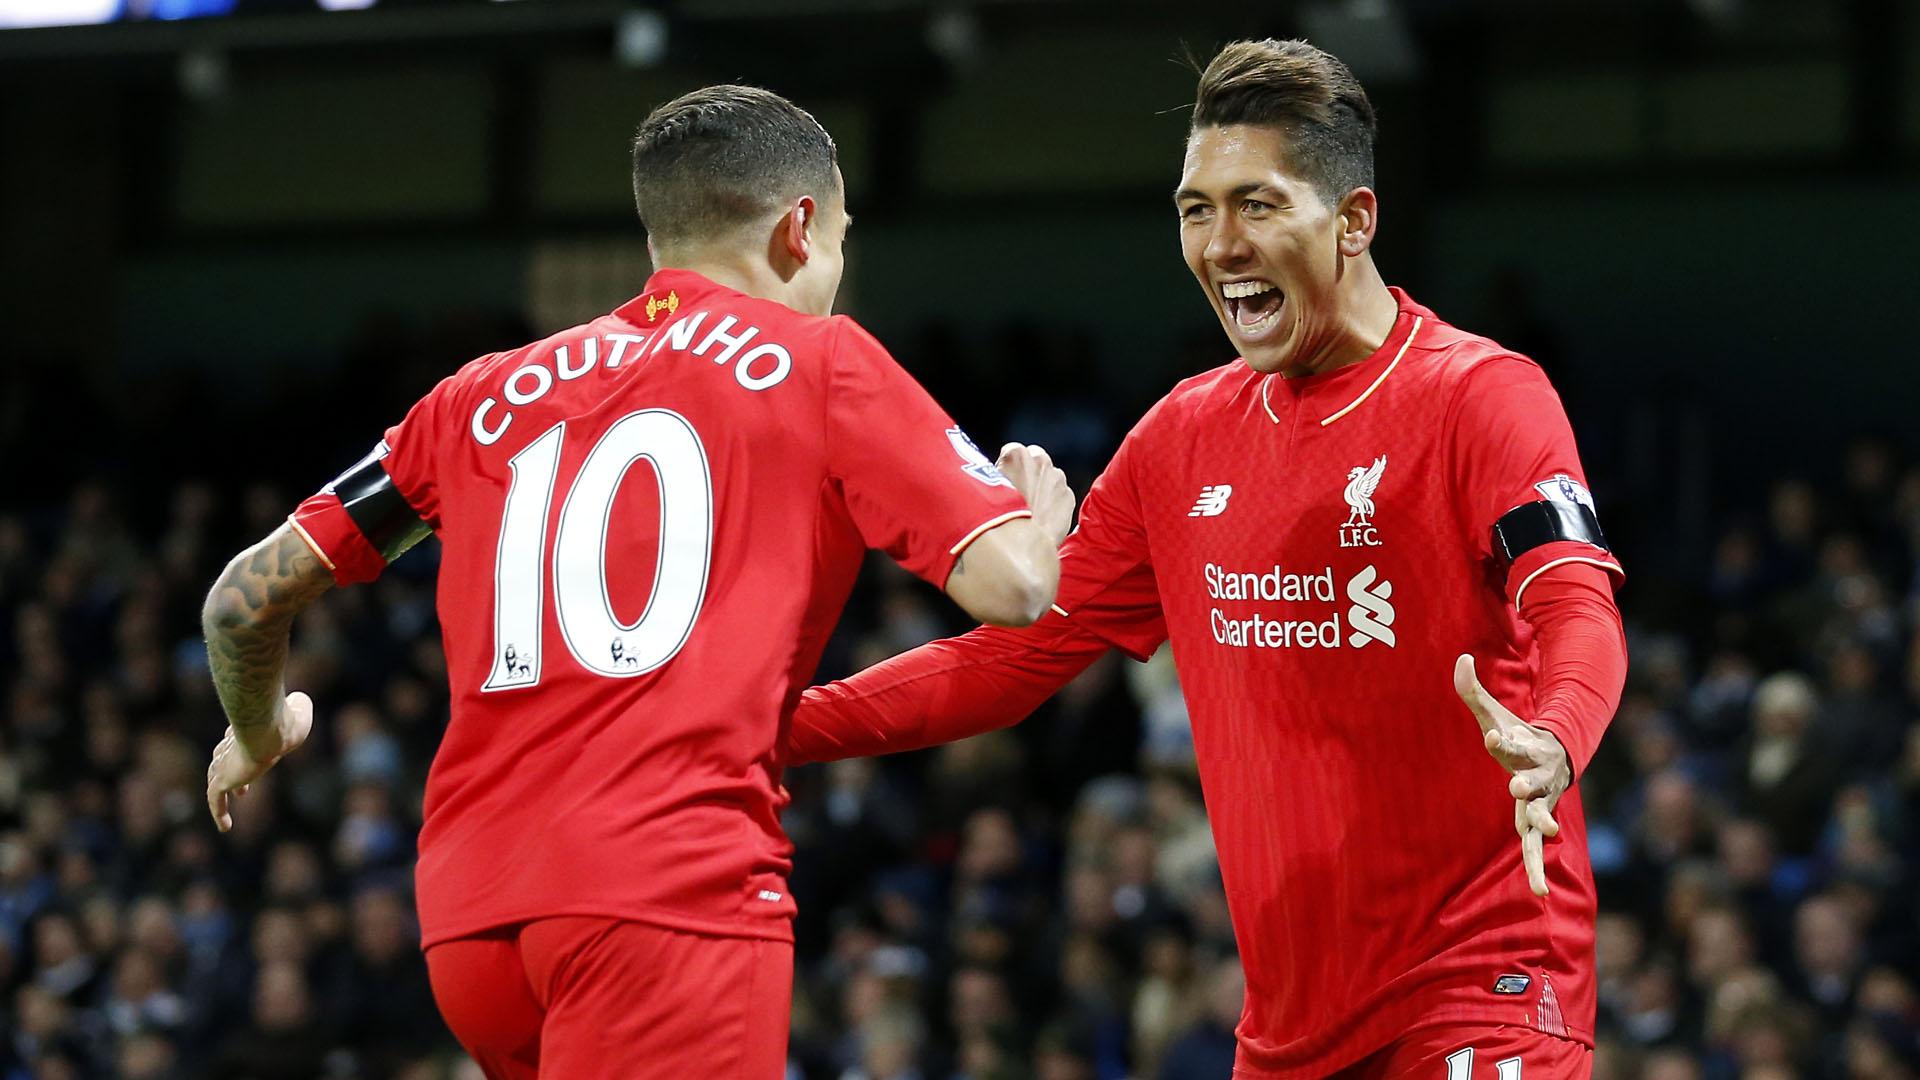 Coutinho e Firmino, brasileiros do Liverpool (AP Photo/Jon Super)